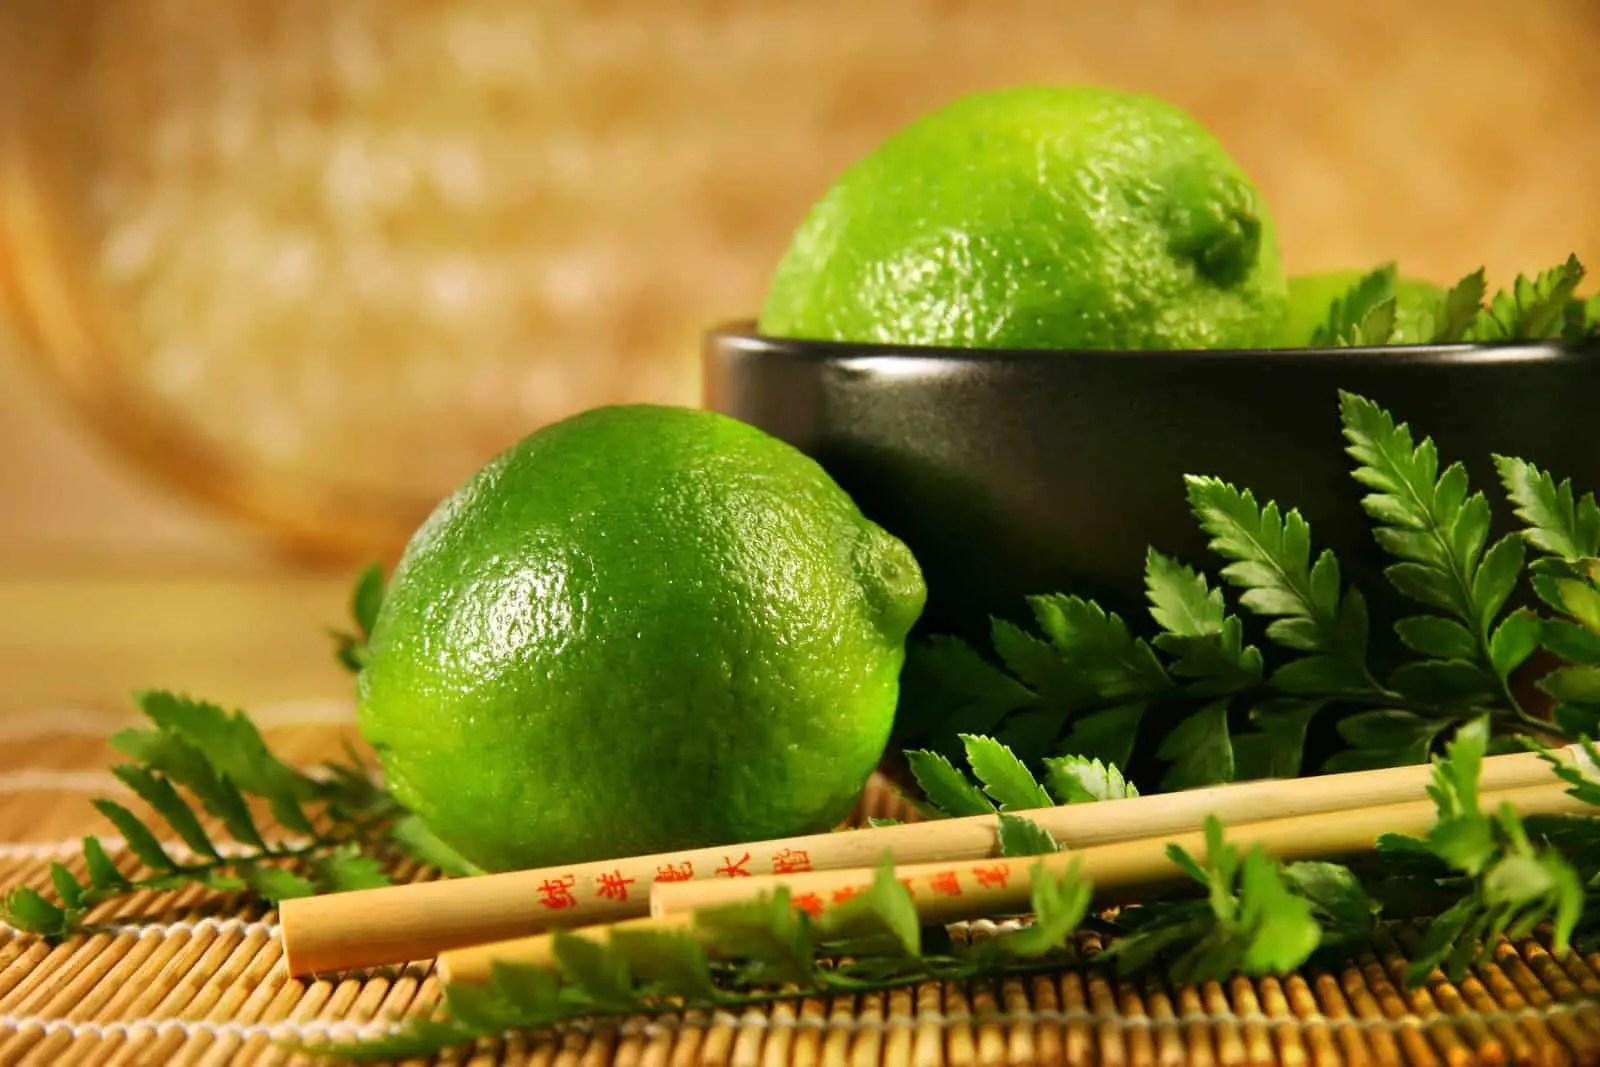 Can You Freeze Whole Limes?